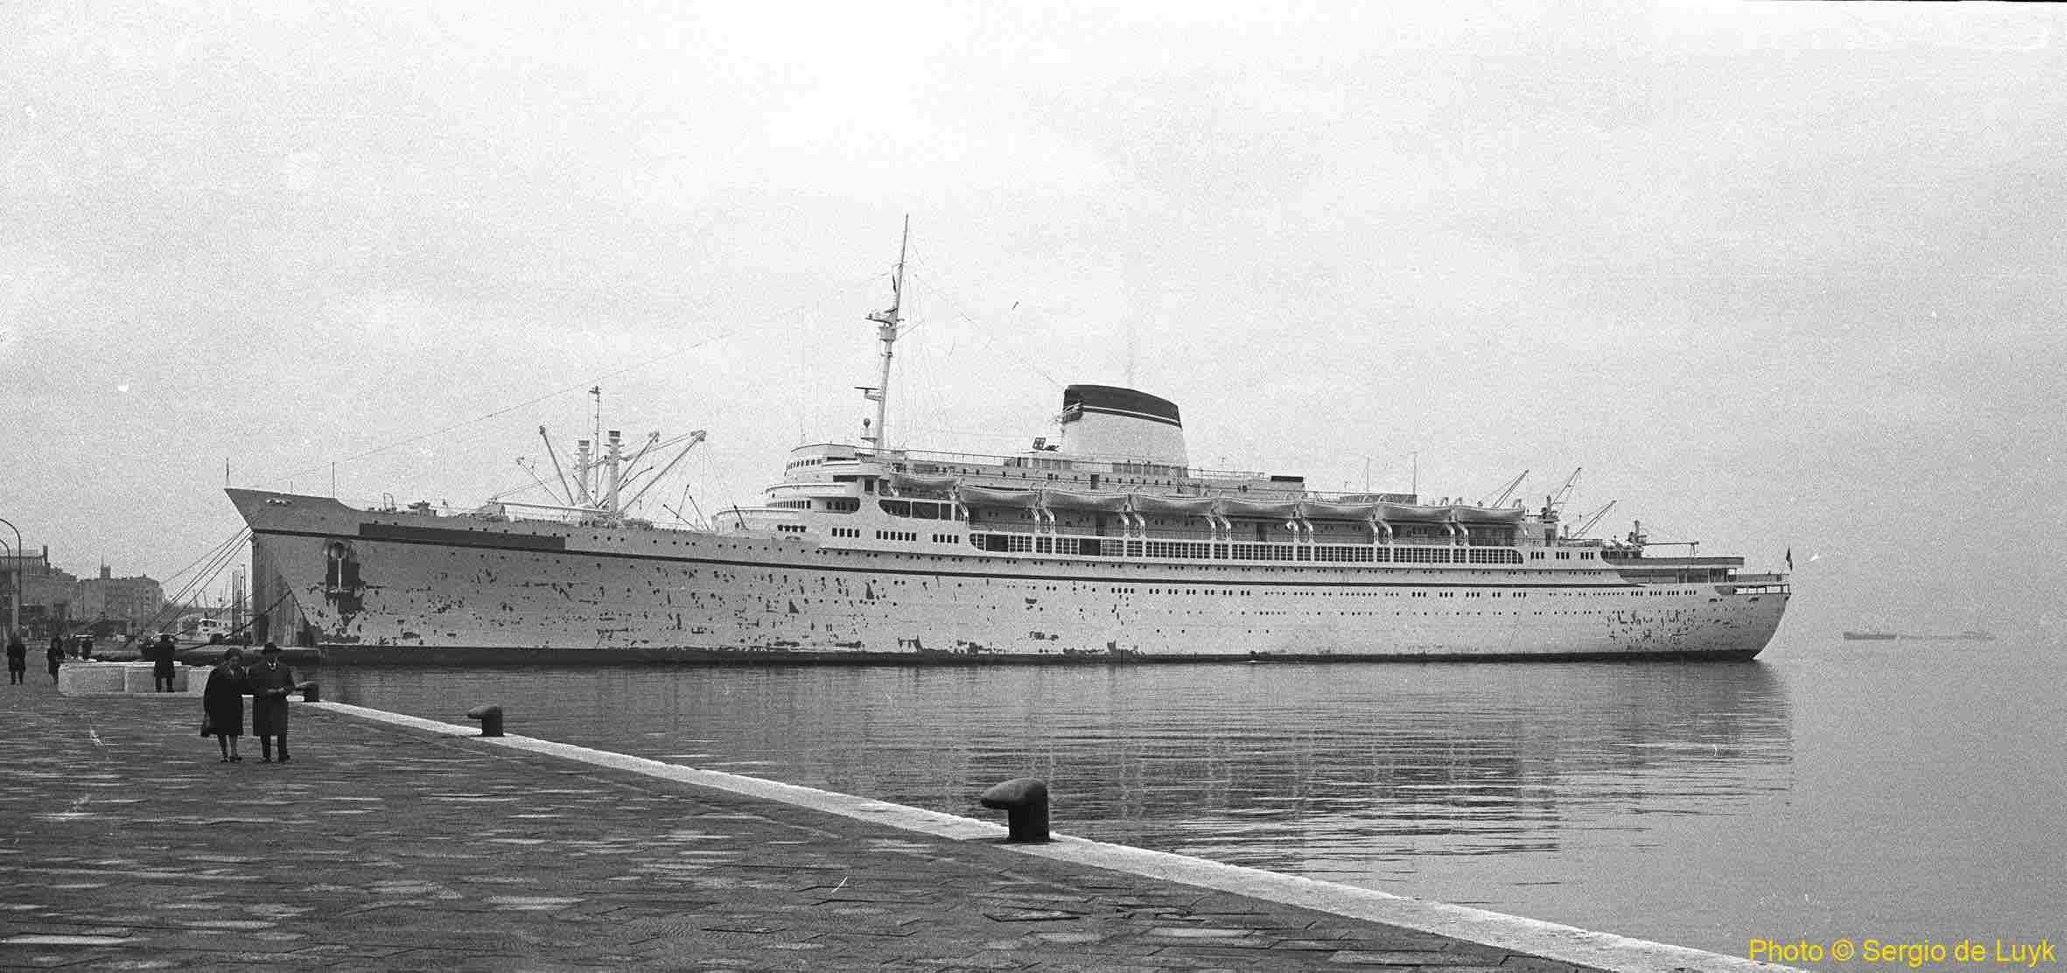 Cristoforo Columbo Docked In Venezuela Liners Pinterest - Columbo cruise ship